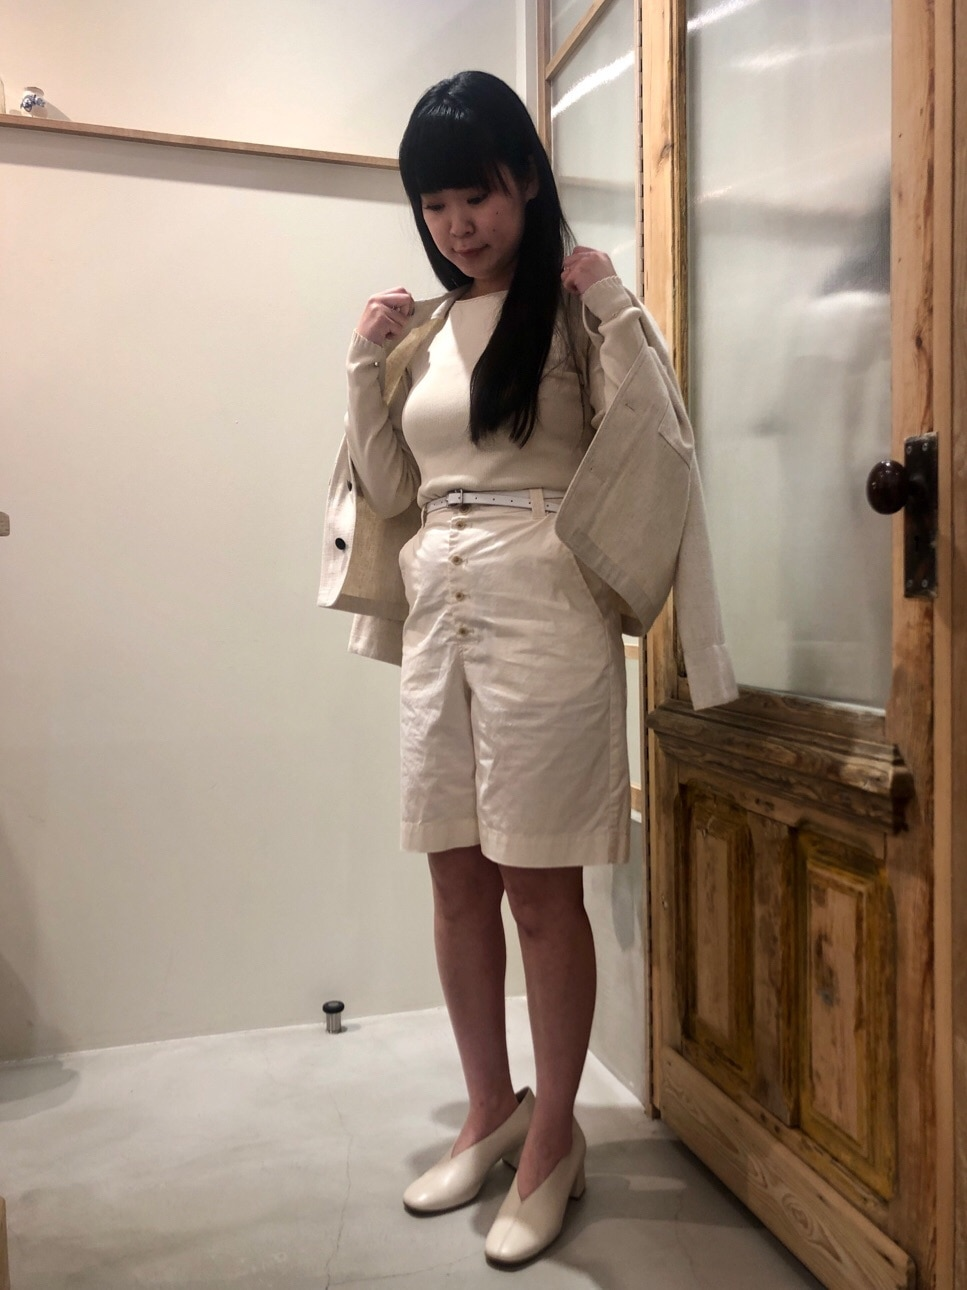 bulle de savon 渋谷スクランブルスクエア 身長:157cm 2020.03.24